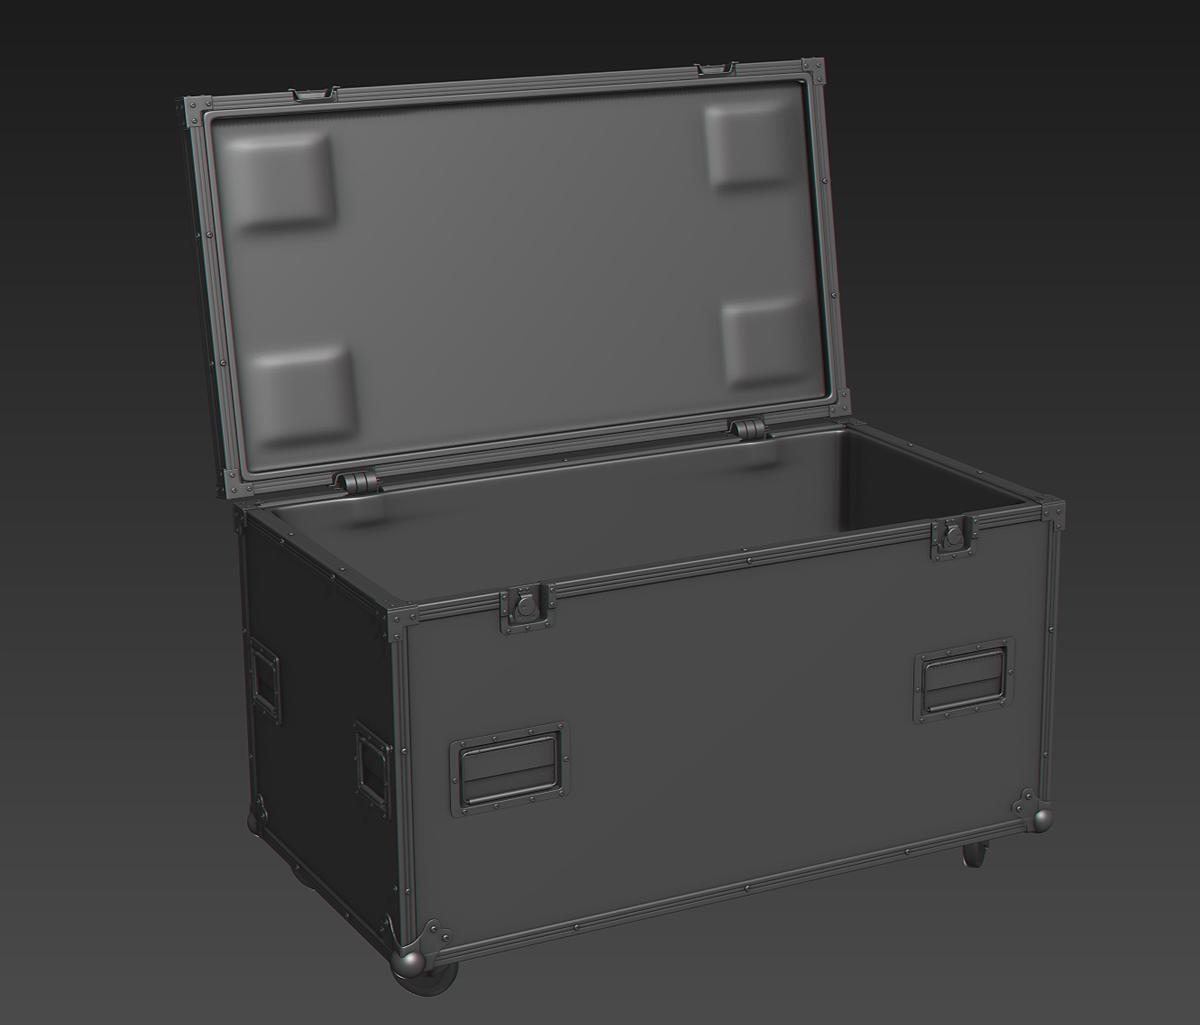 crate_02.jpg